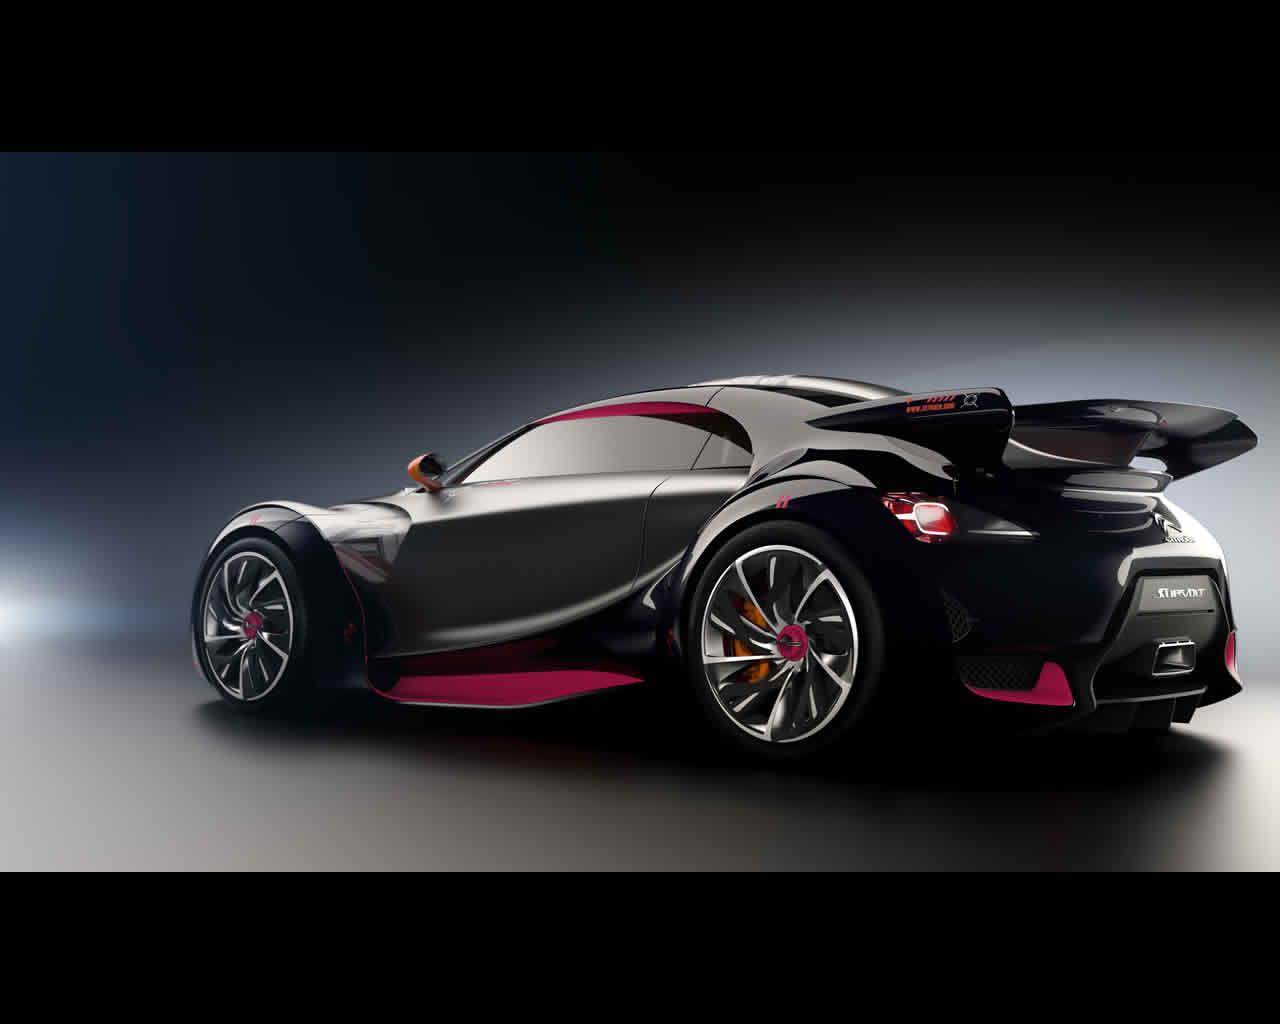 citro n survolt electric sports car concept 2010. Black Bedroom Furniture Sets. Home Design Ideas